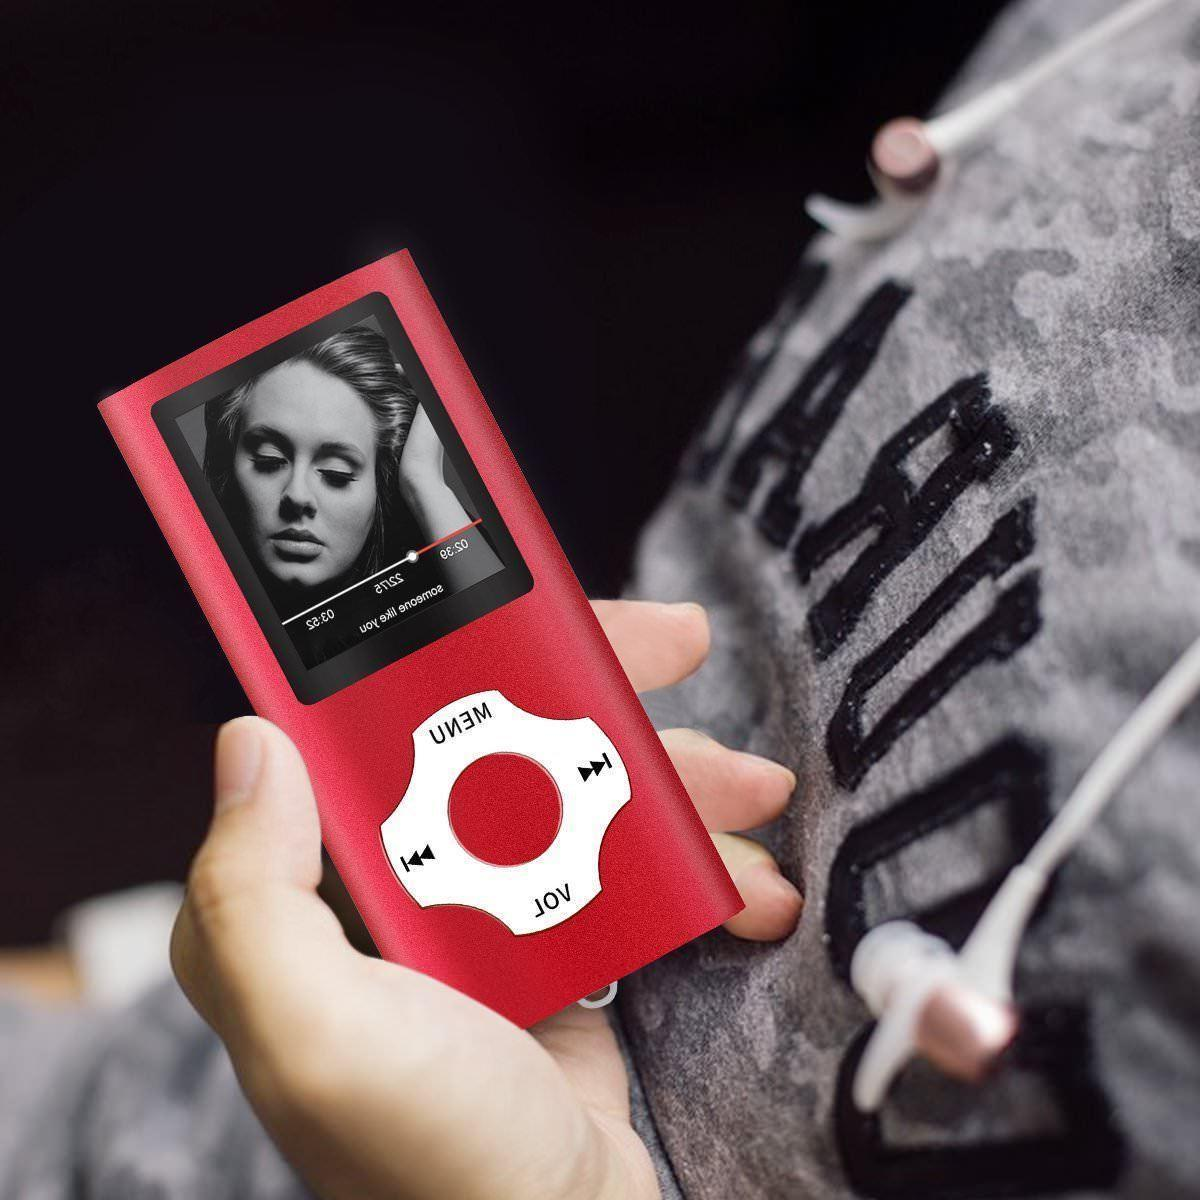 Digital Compact Portable MP4 64 SD Photo Recorder